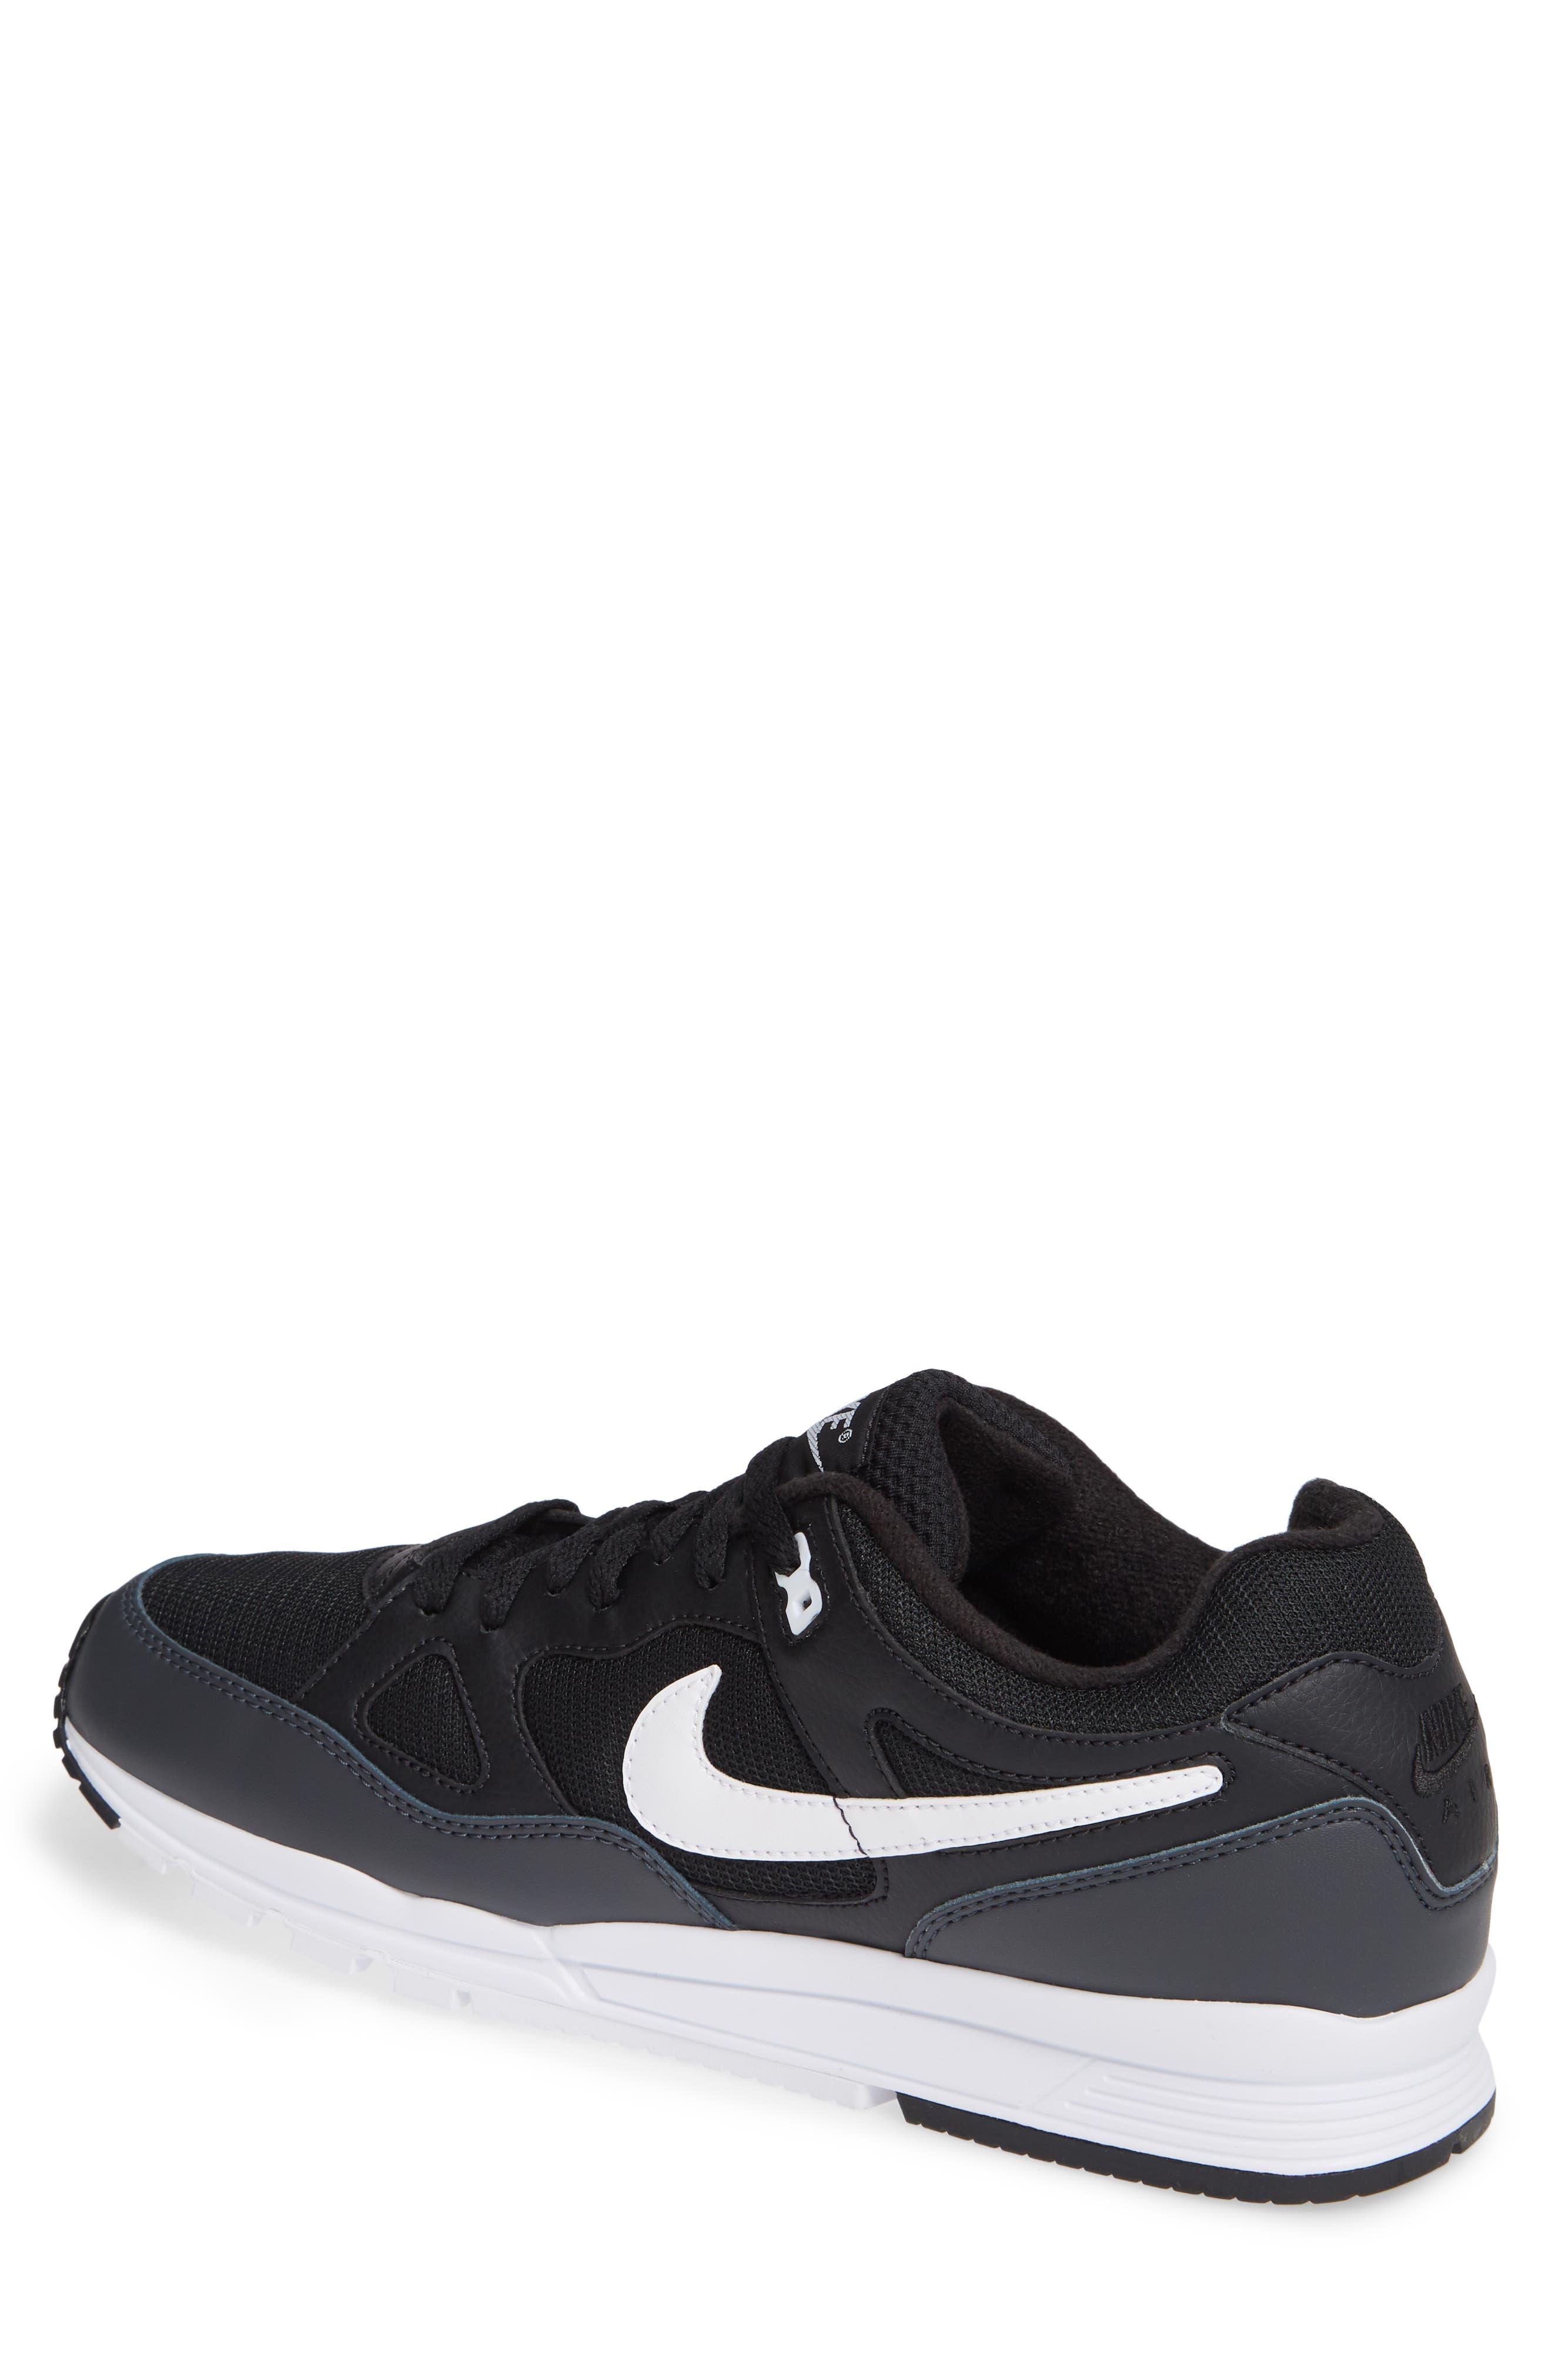 Air Span II Sneaker,                             Alternate thumbnail 2, color,                             BLACK/ WHITE/ ANTHRACITE